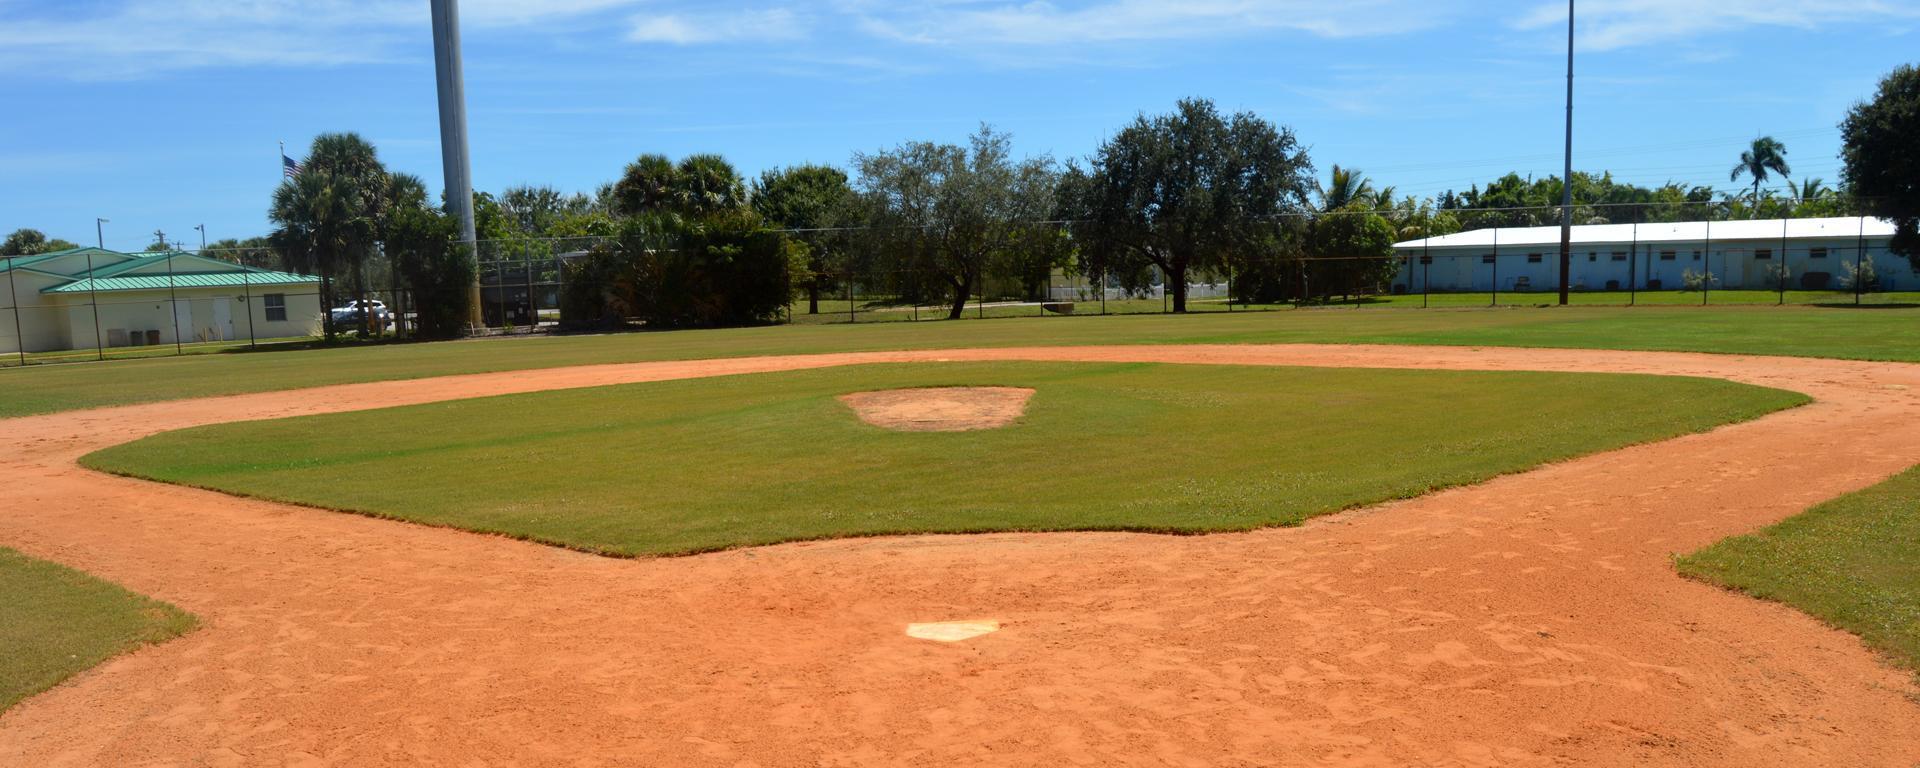 Baseball and softball fields at Langford Park